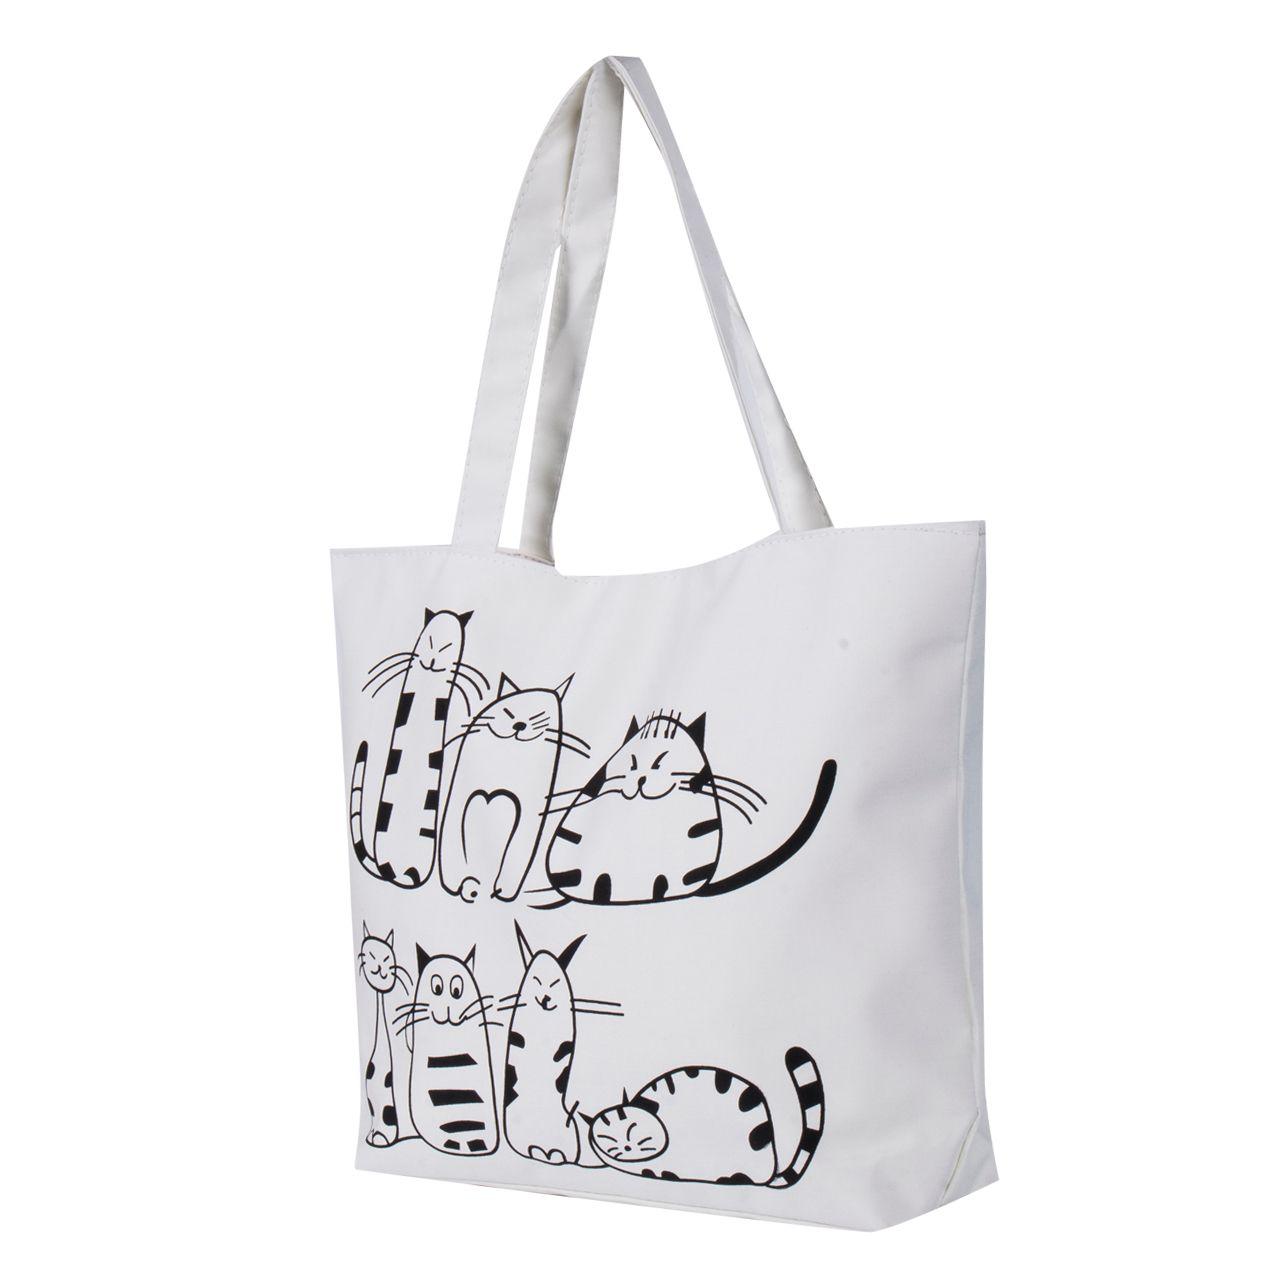 Women Canvas Handbag Cartoon Cat Printed Shoulder Bag Female Large Capacity  Ladies Beach Bag Women Canvas Tote Shopping Handbags Handbags Purses From  ... 23b769696bfe3